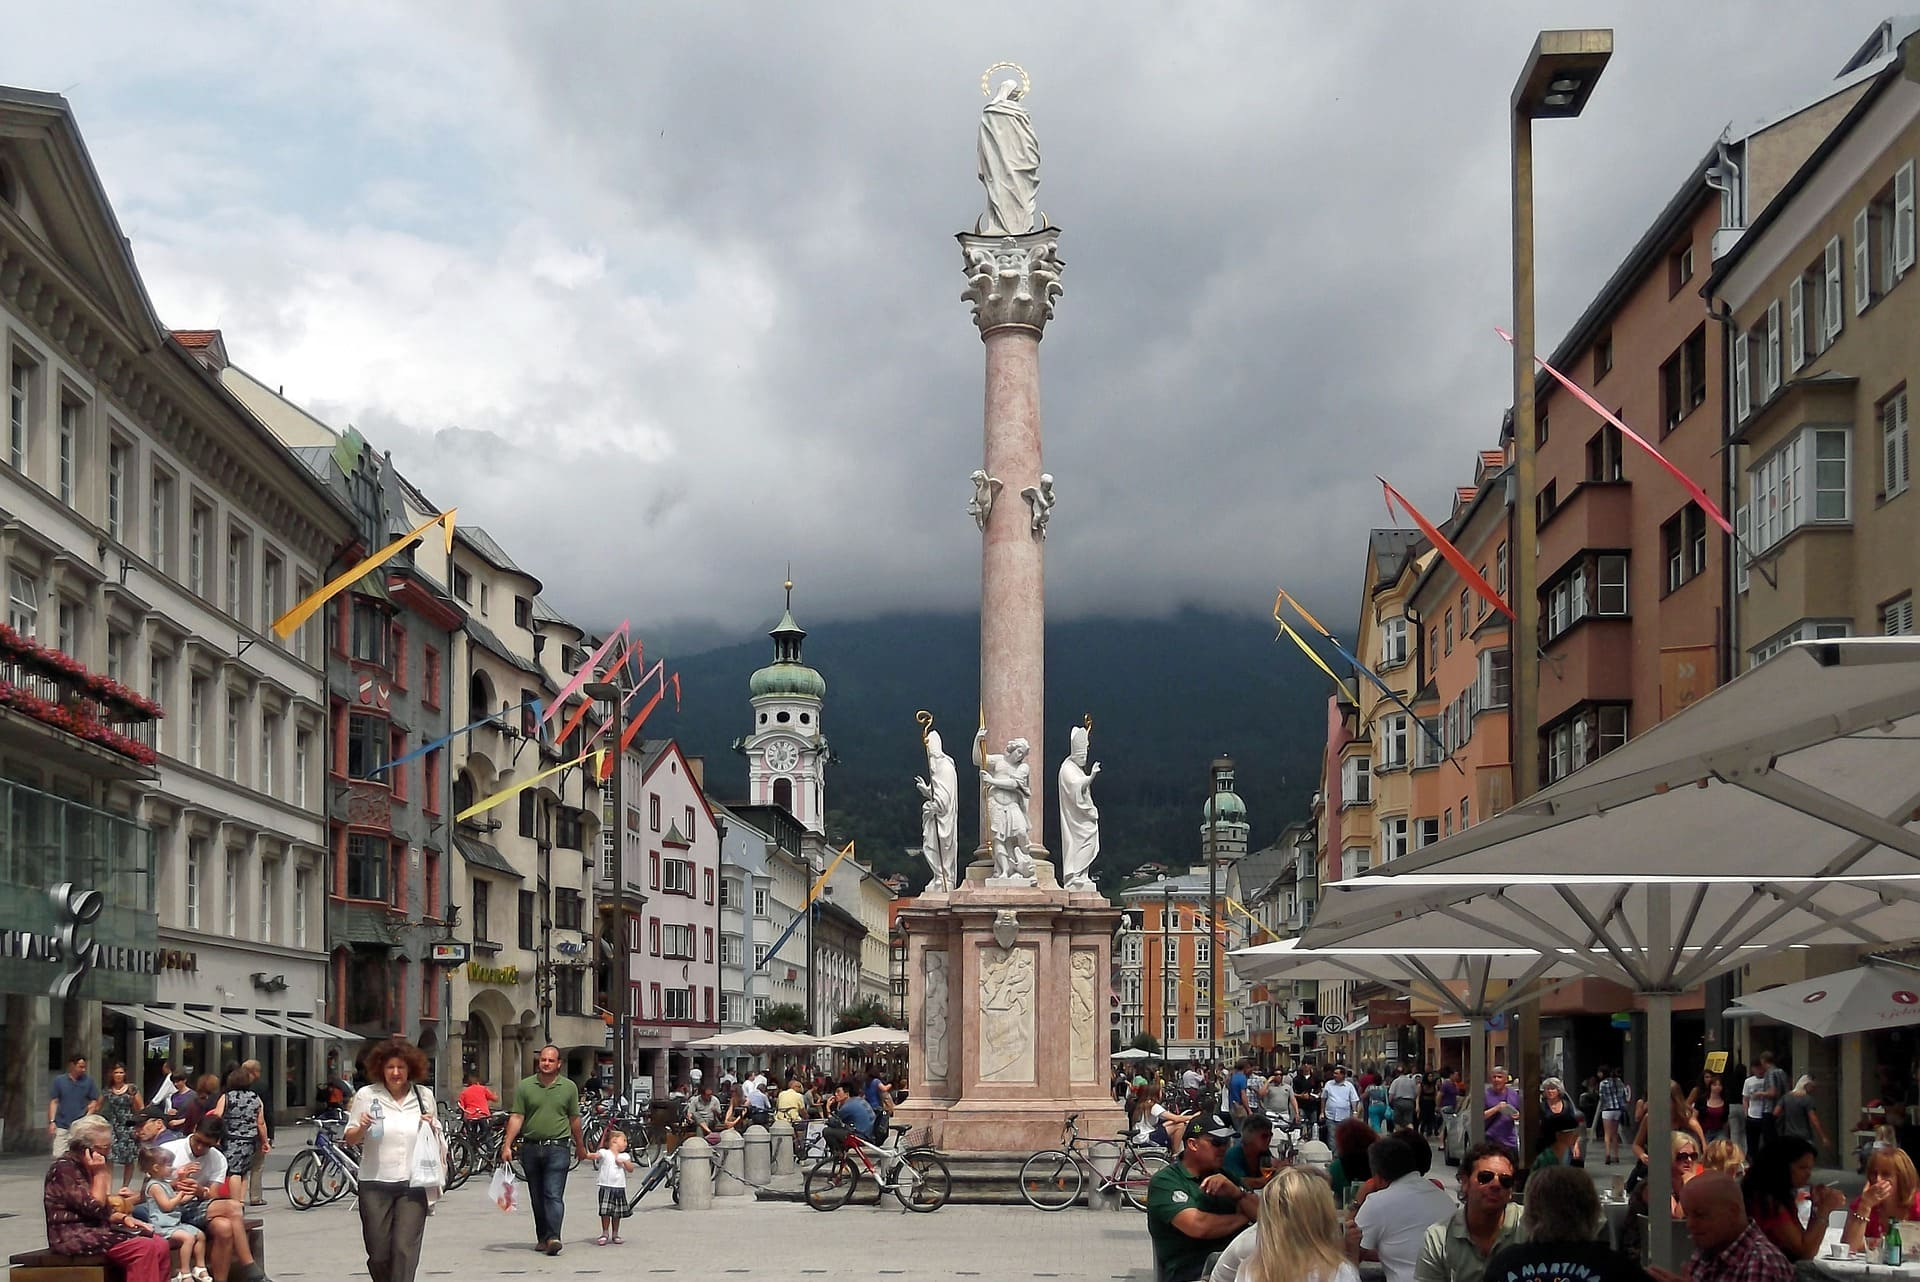 Centro storico Innsbruck